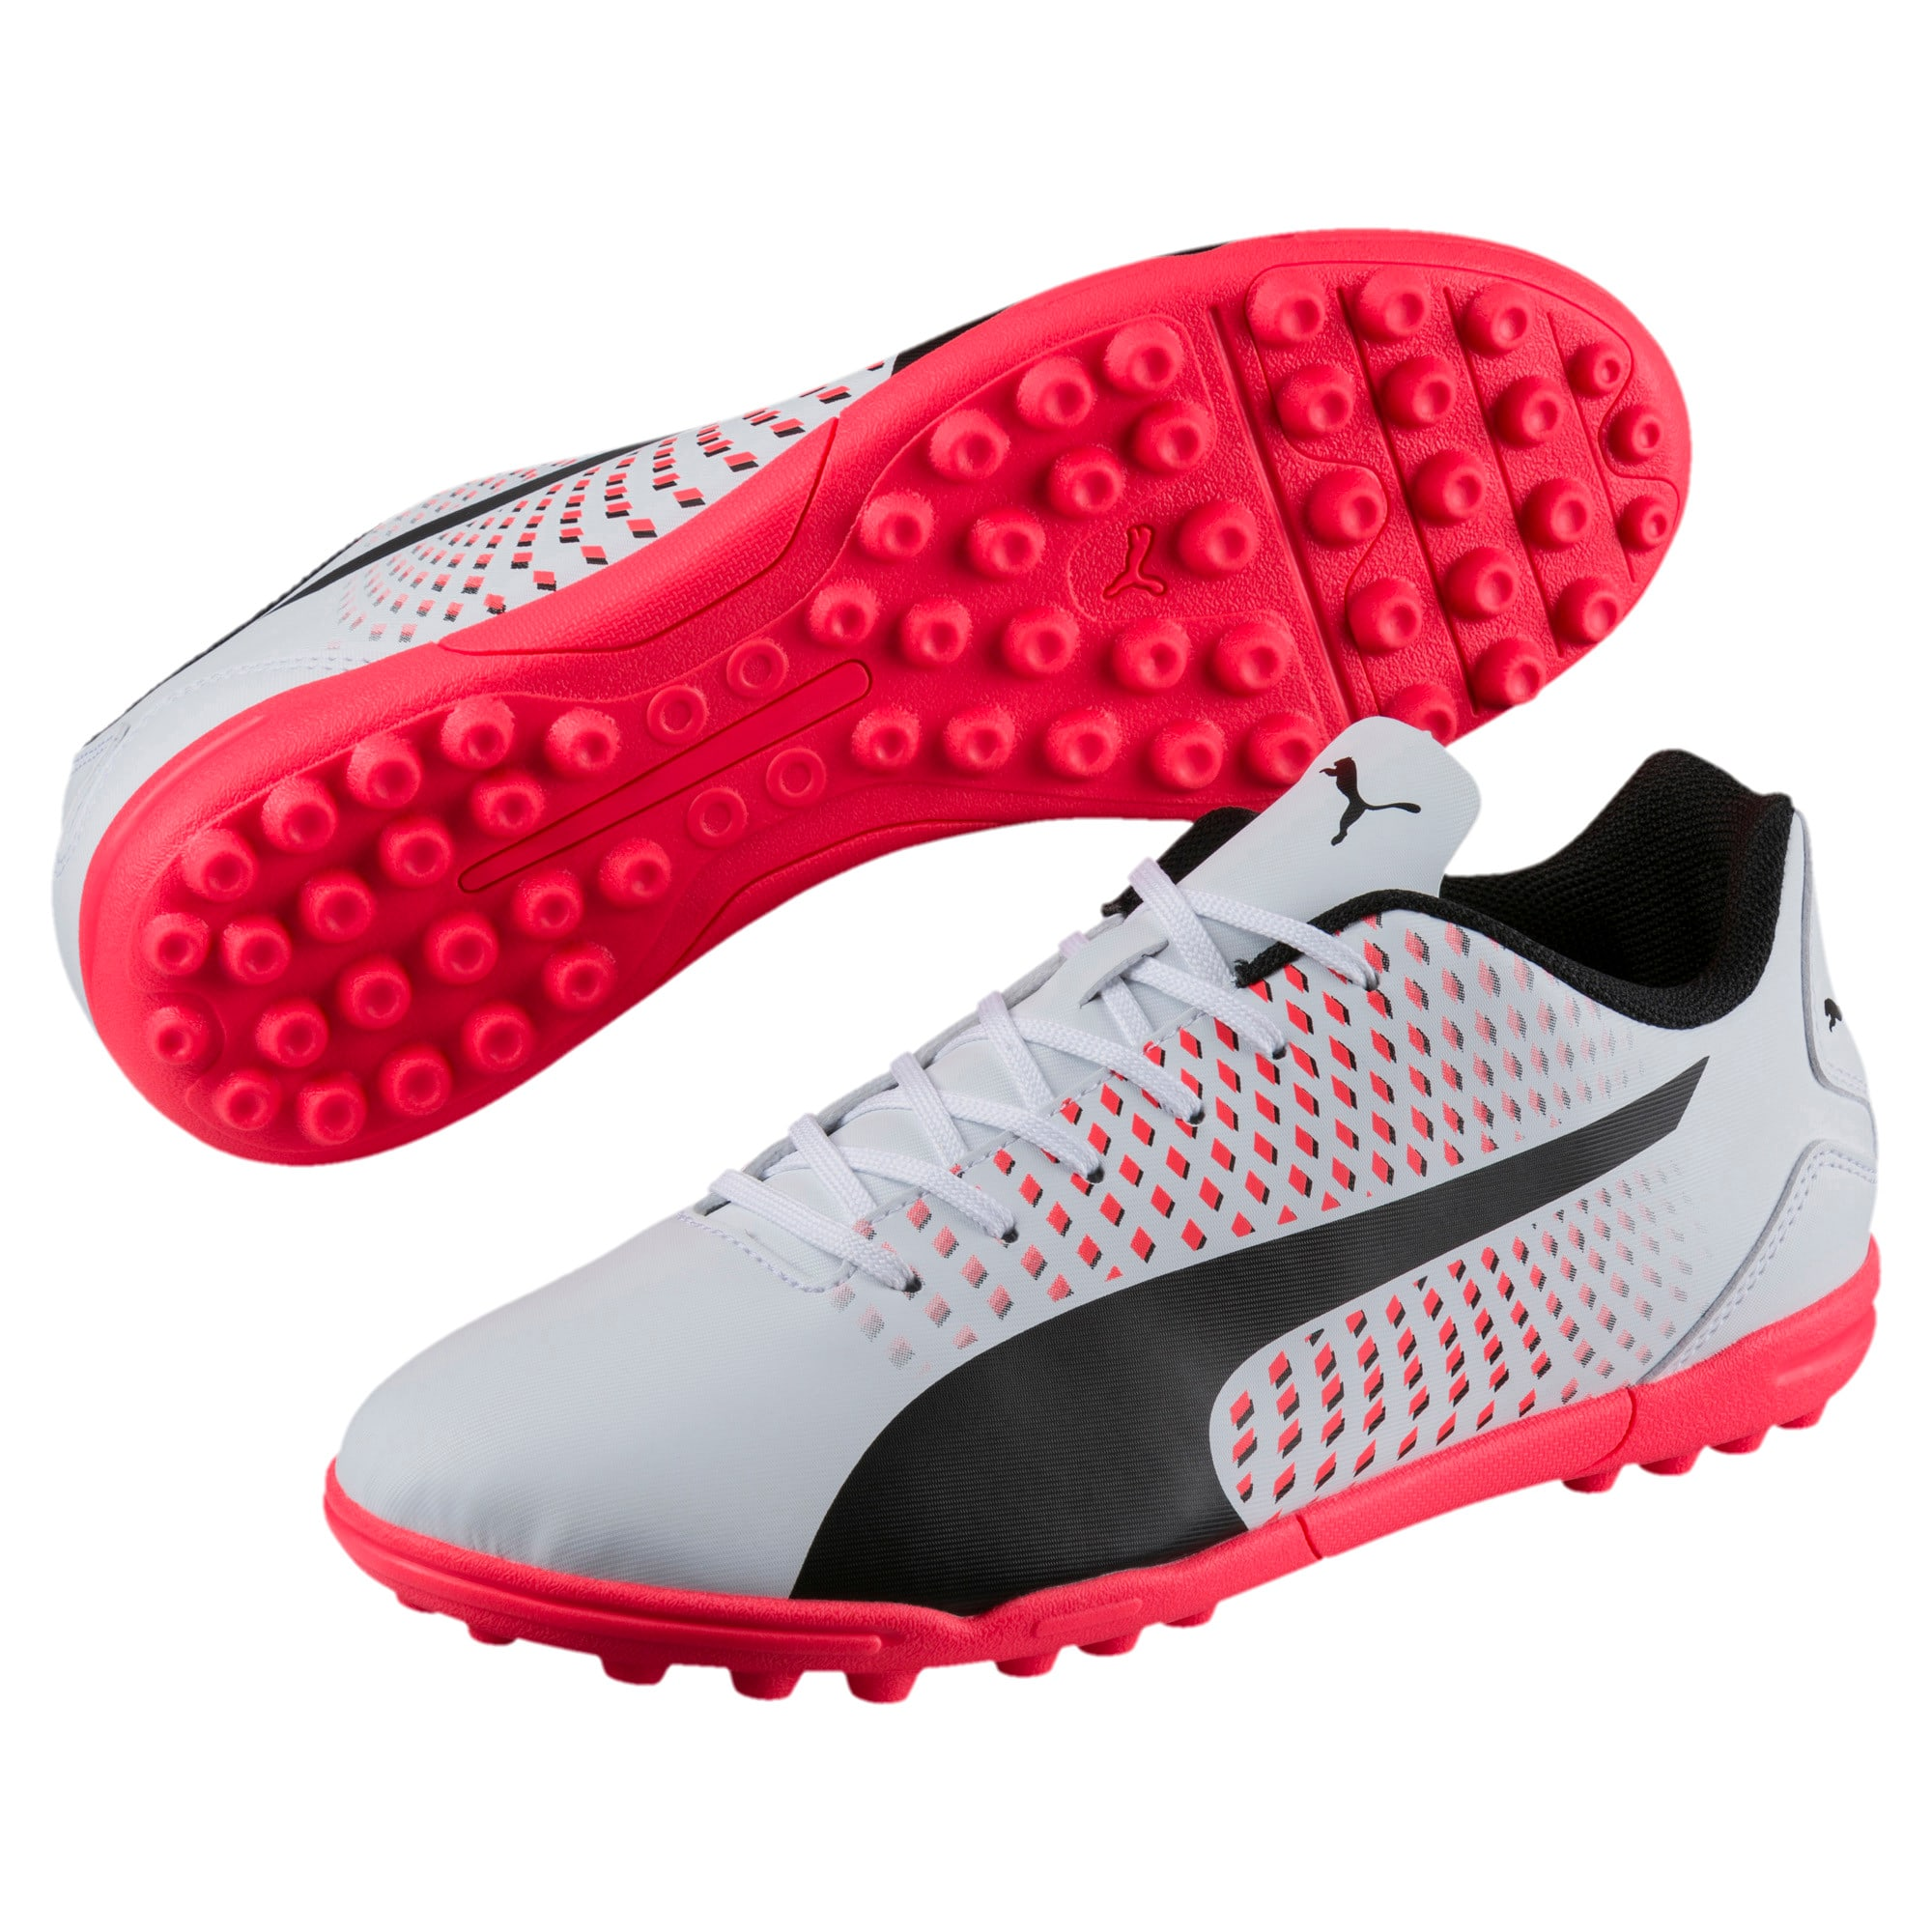 Thumbnail 2 of Adreno III TT Men's Football Boots, White-Black-Coral, medium-IND